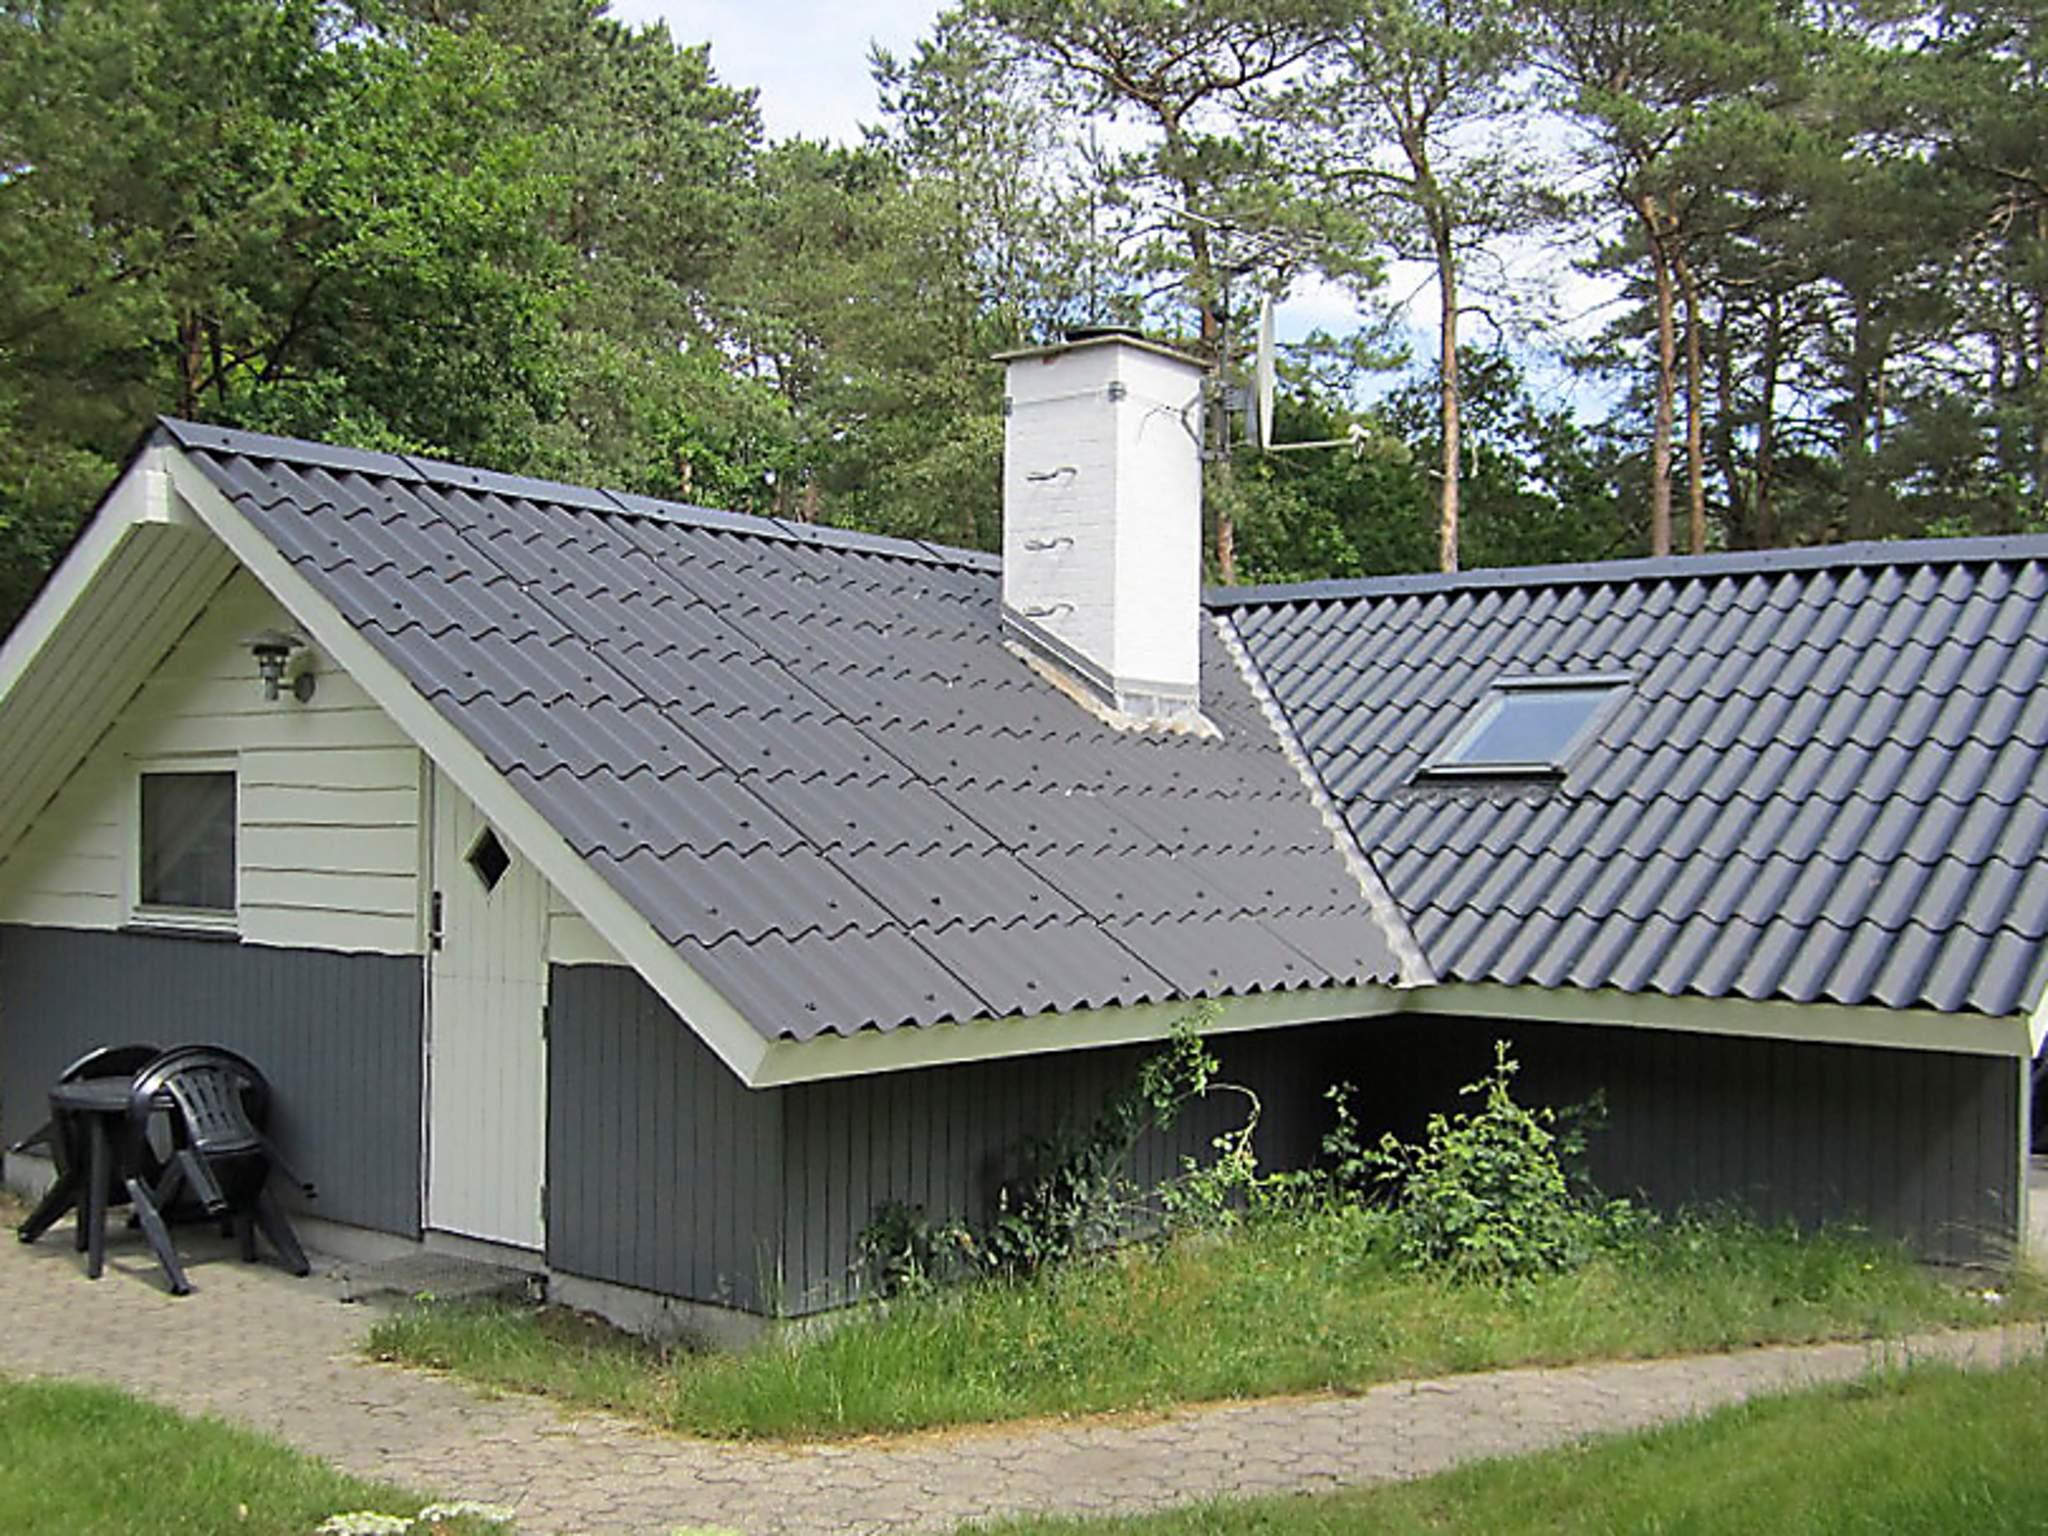 Ferienhaus Hou Nord/Melholt (88048), Hou, , Nordostjütland, Dänemark, Bild 23